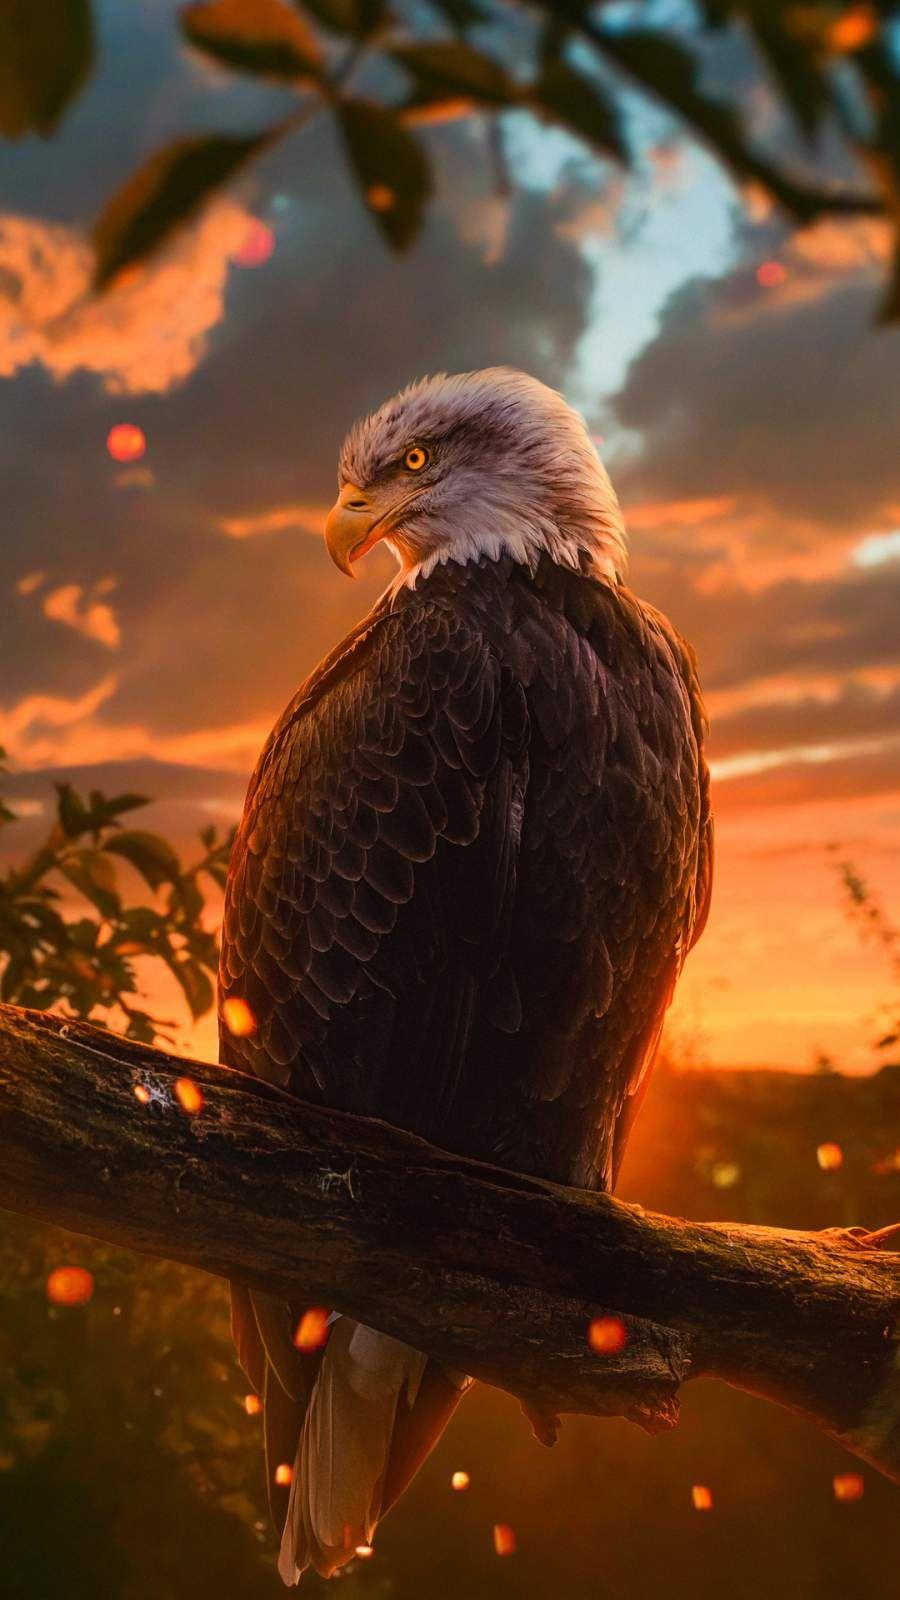 Golden Eagle Iphone Wallpaper Eagle Wallpaper Bald Eagle Wild Animal Wallpaper